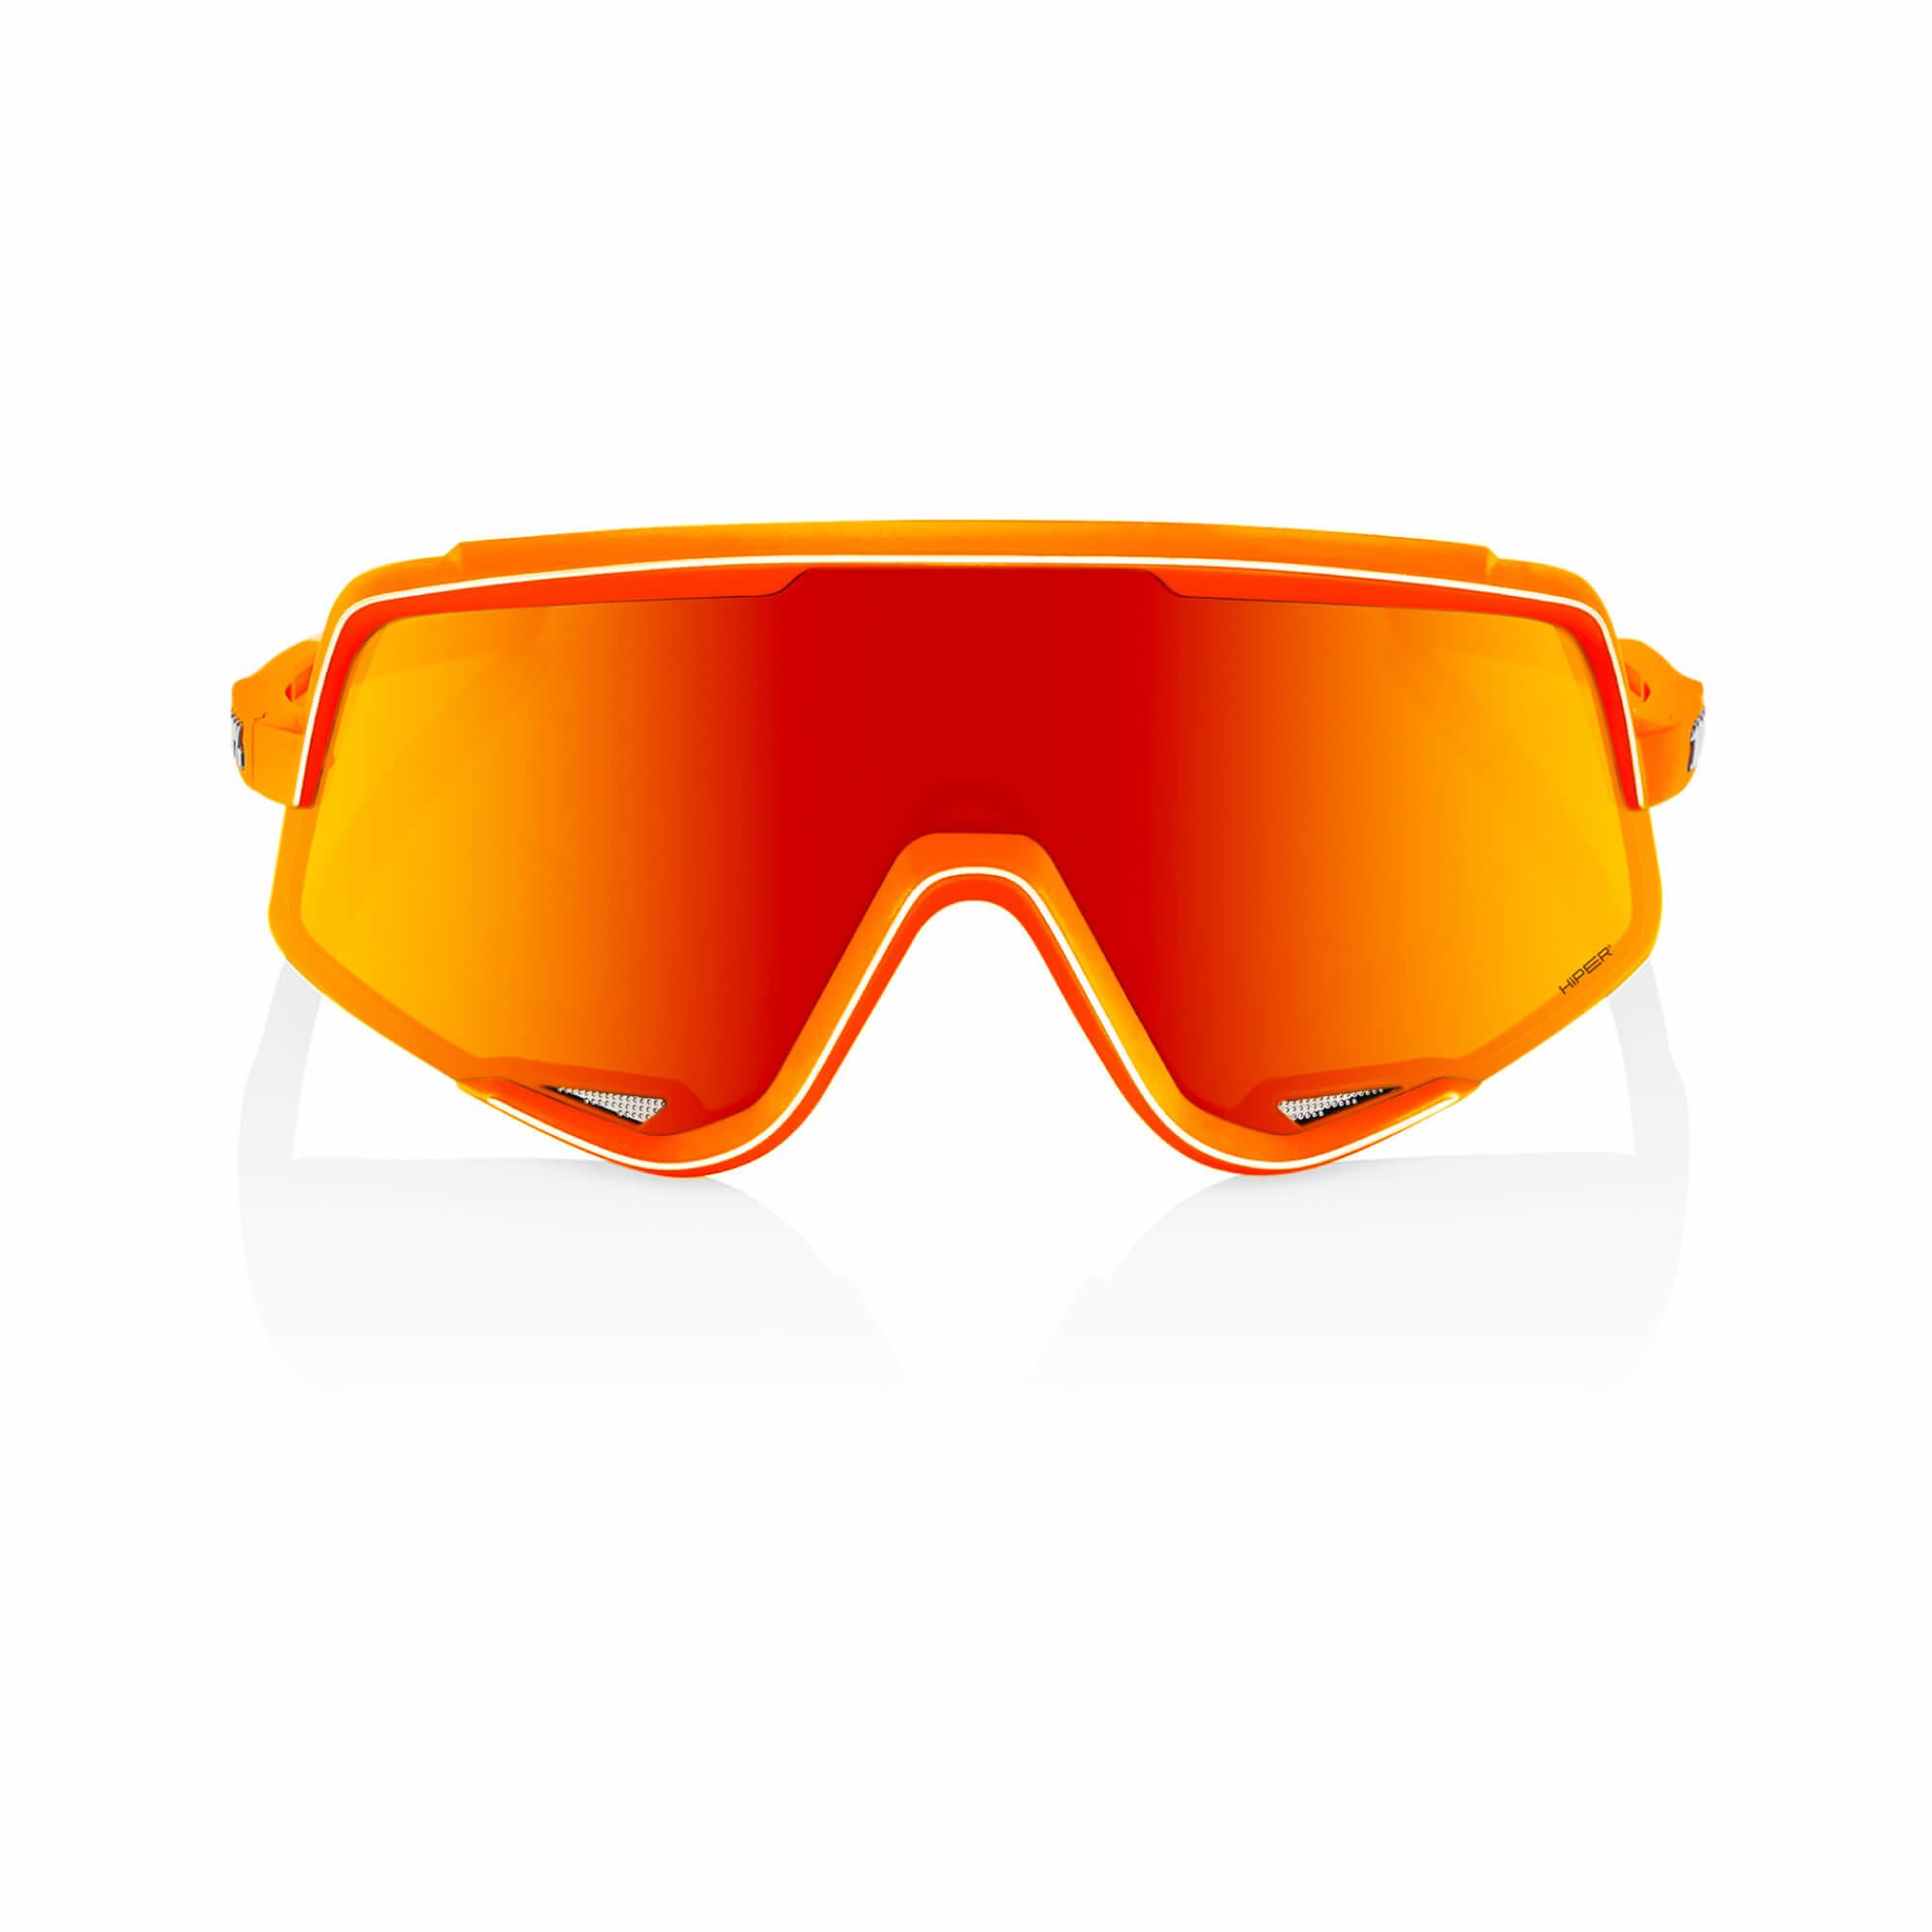 Glendale Neon Orange - Hiper Red Lens-2